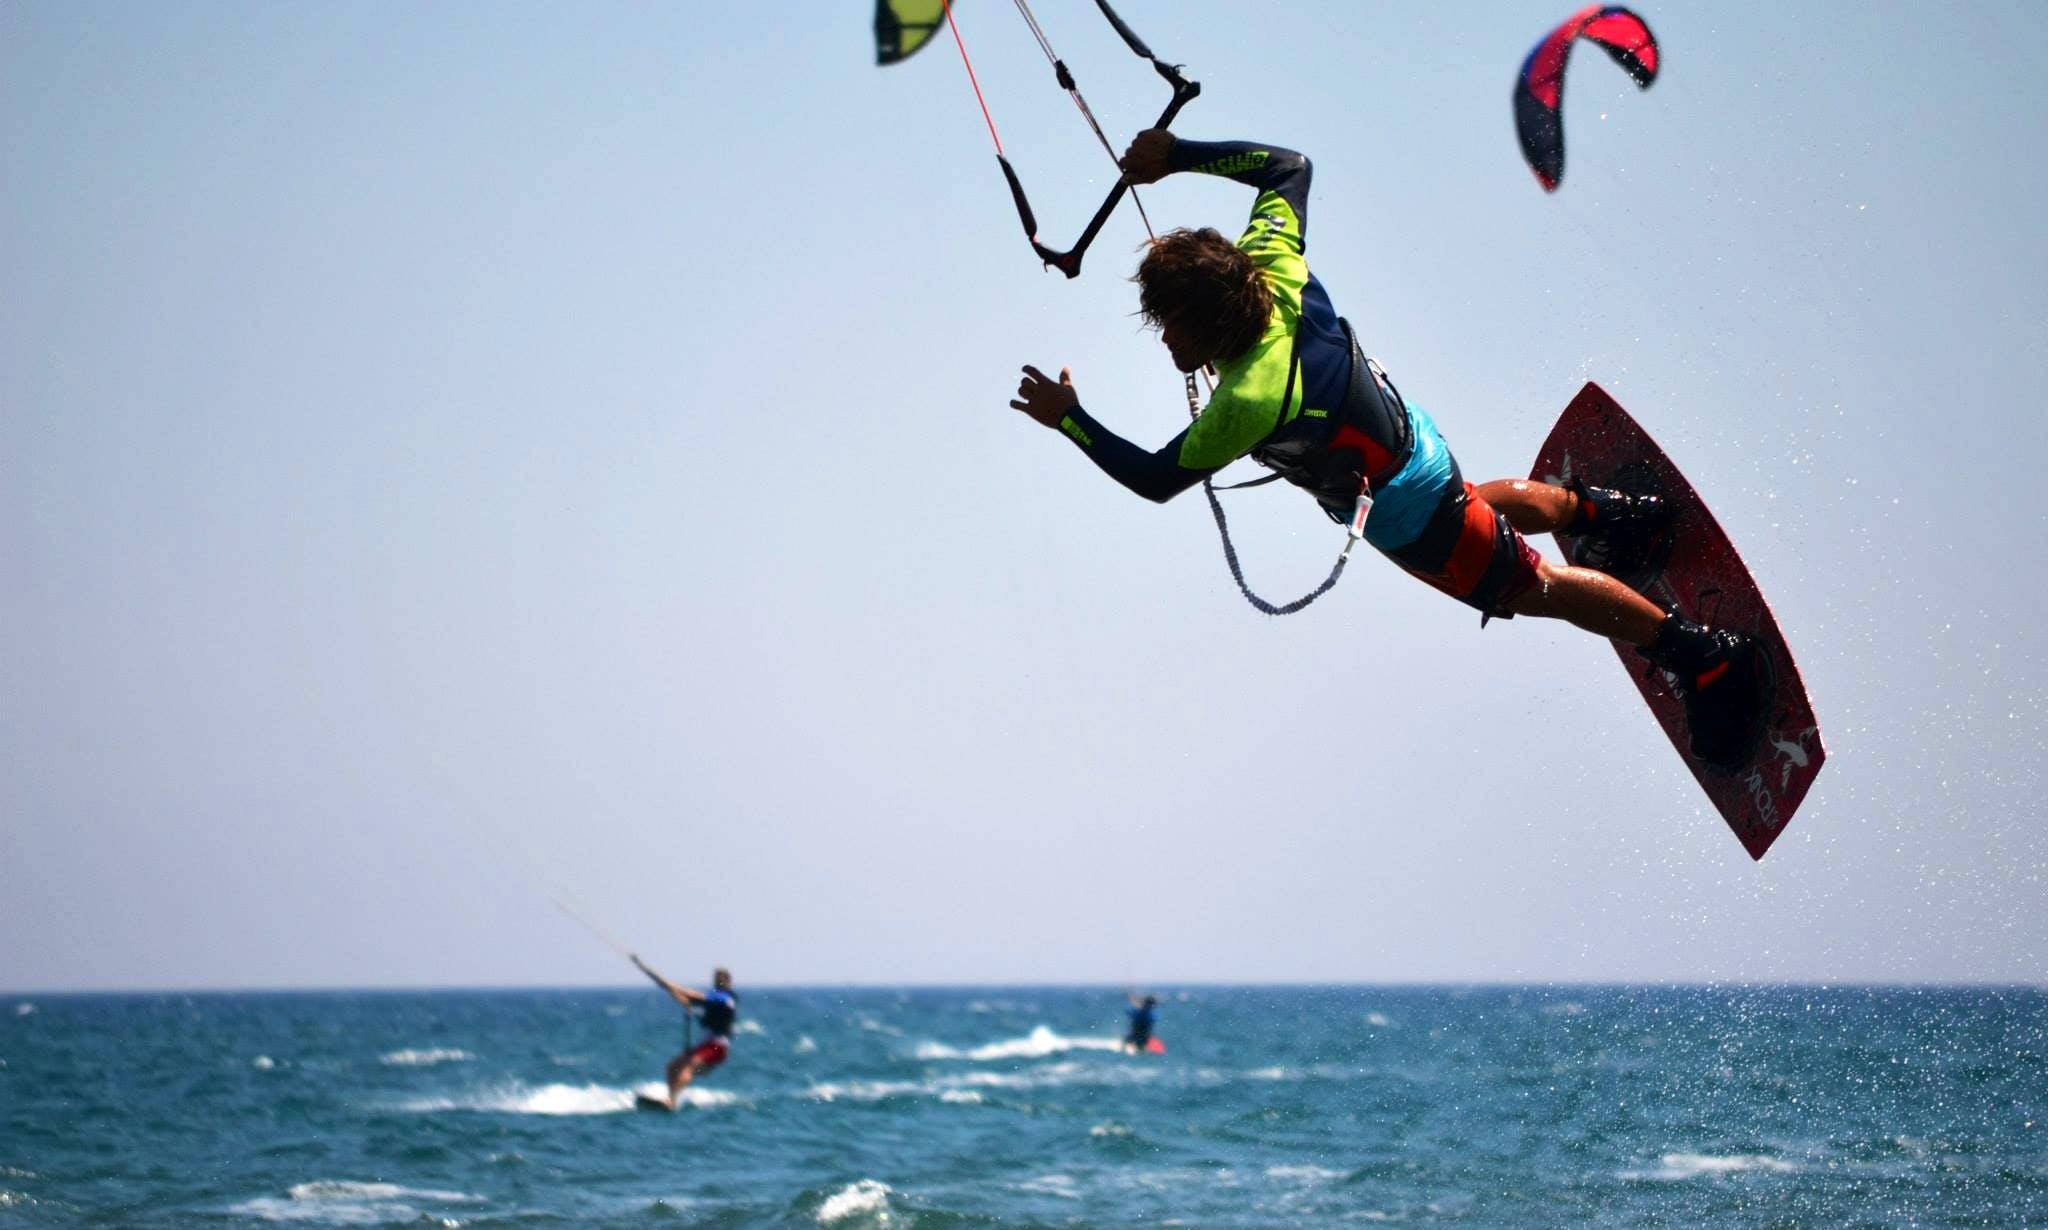 Enjoy Kiteboarding Courses & Rentals in Opština Ulcinj, Montenegro